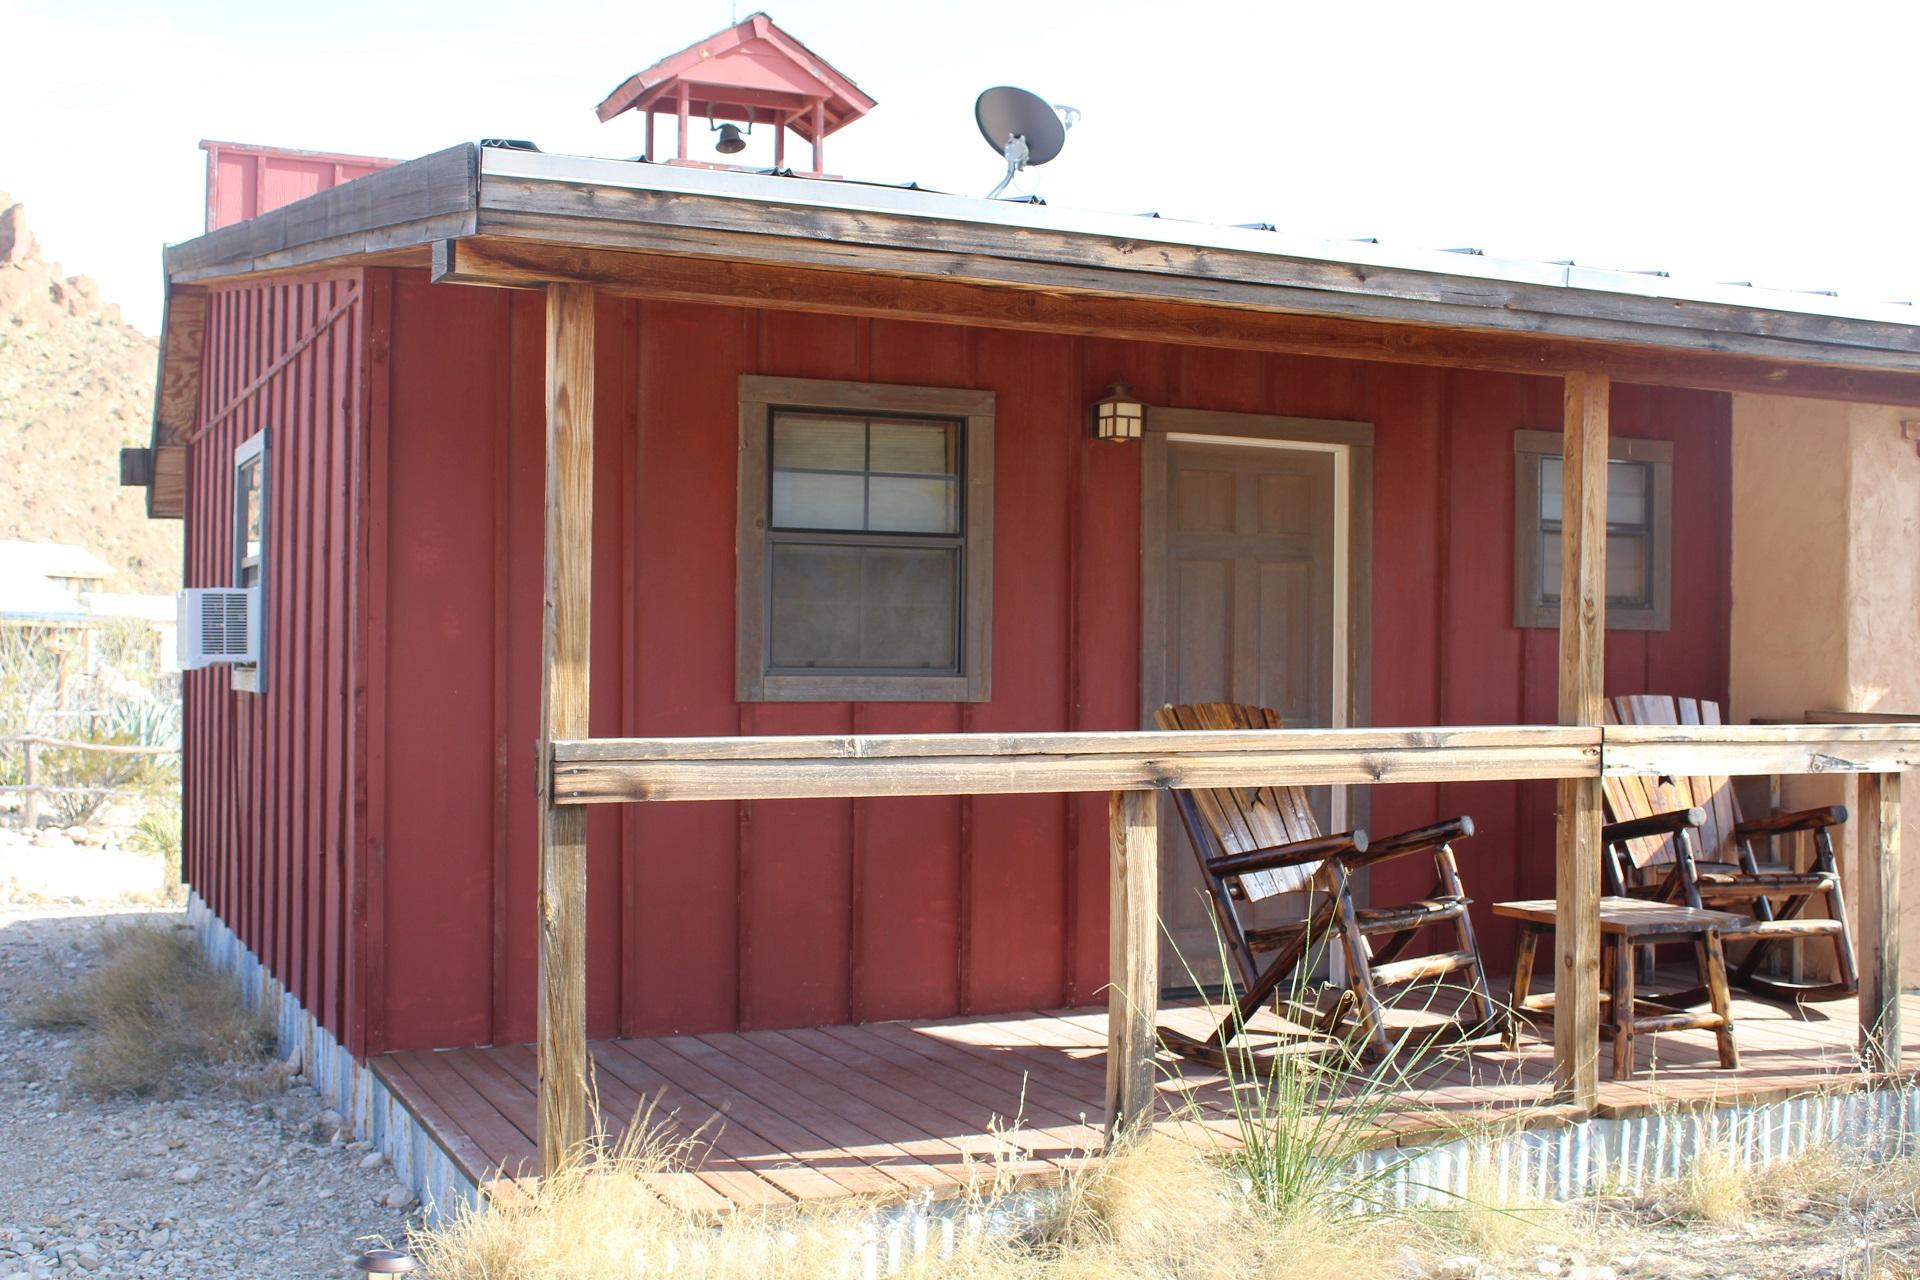 The Schoolhouse Room - Ten Bits Ranch | Cowboy Inn